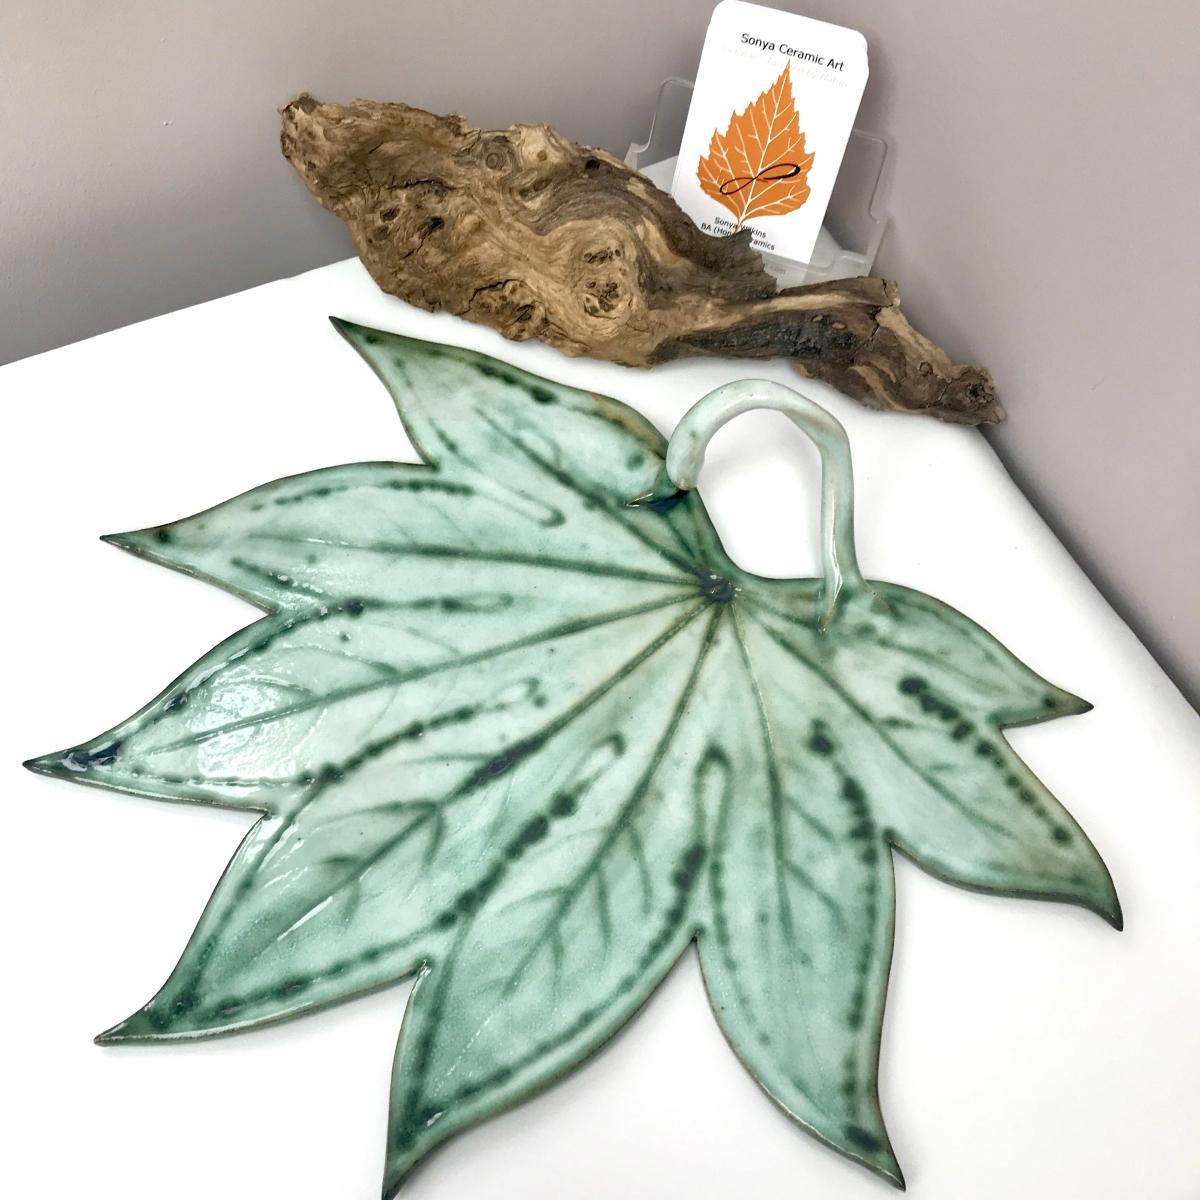 Fatsia Leaf Sharing Platter by Sonya Ceramic Art